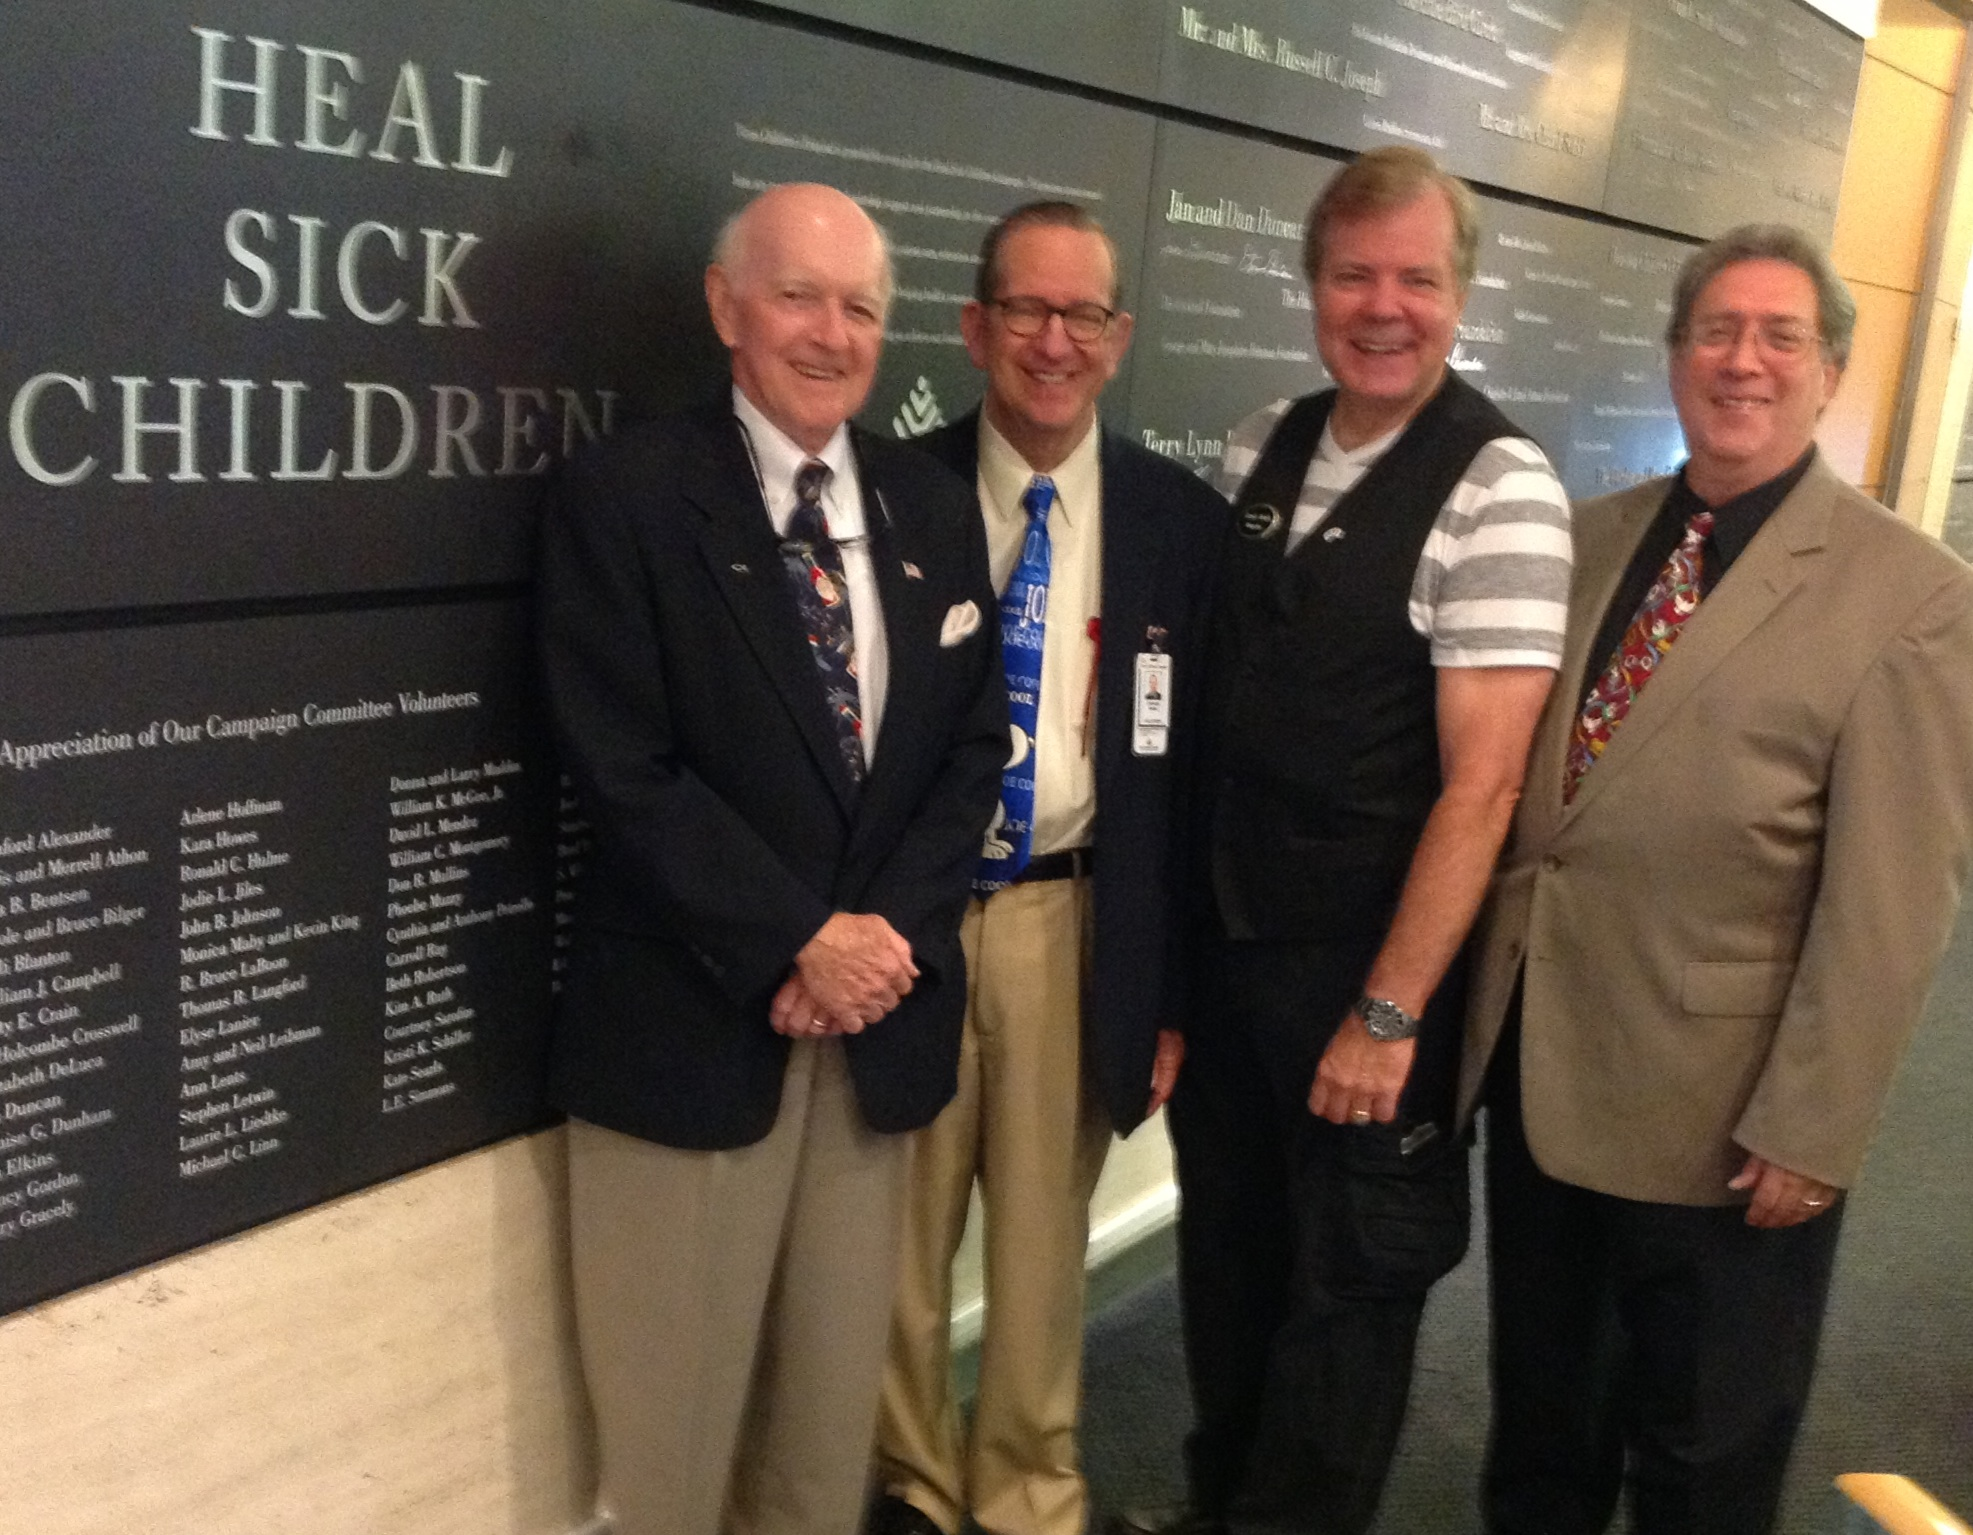 Bill King, Steve Shain, Scott Wells and Gene Protas